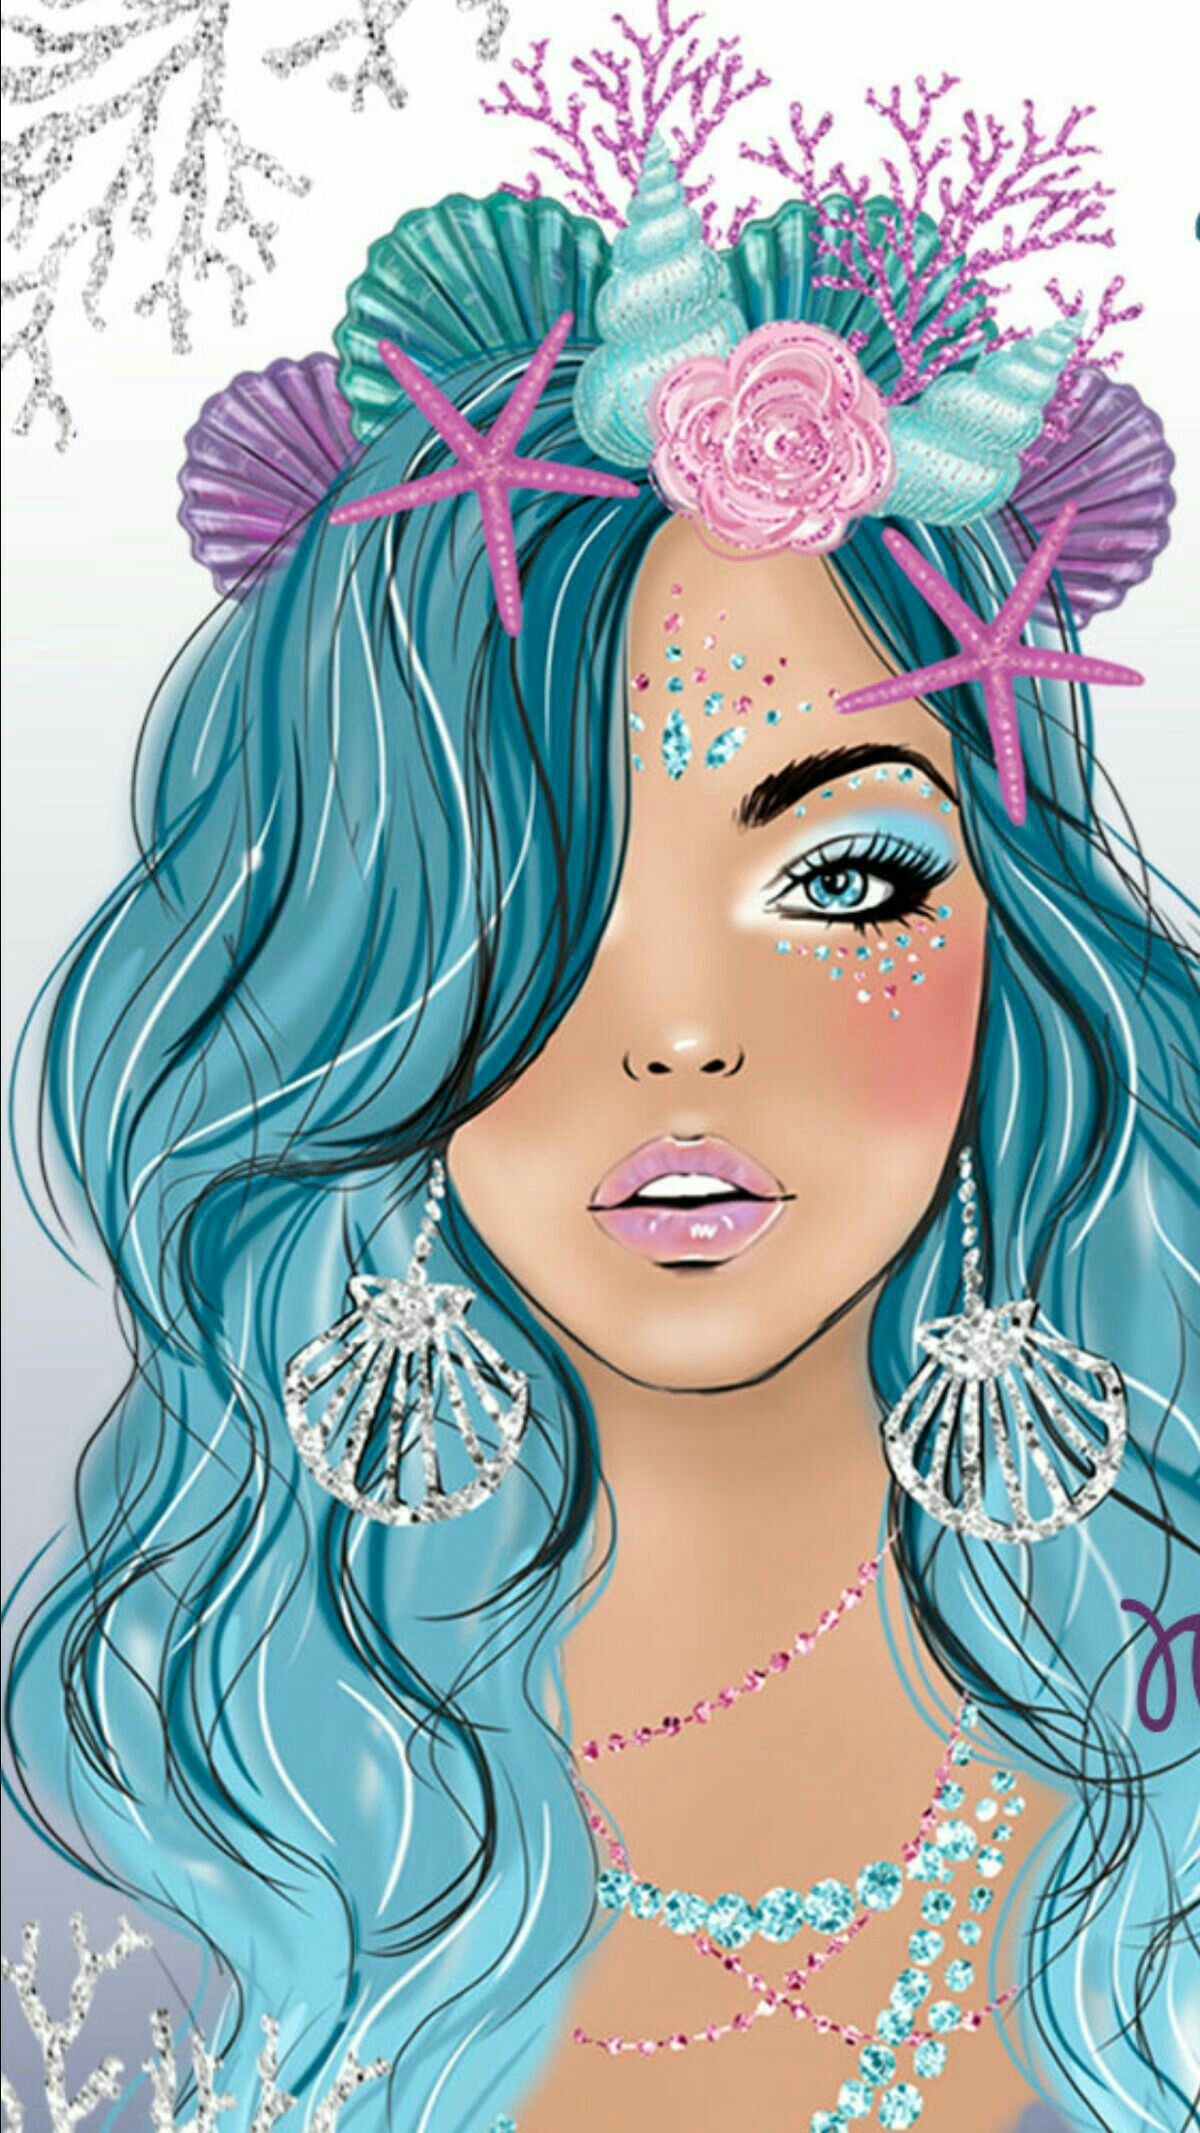 Pin By Keiko Francis On I M Really A Mermaid Mermaid Drawings Mermaid Wallpapers Unicorn Art